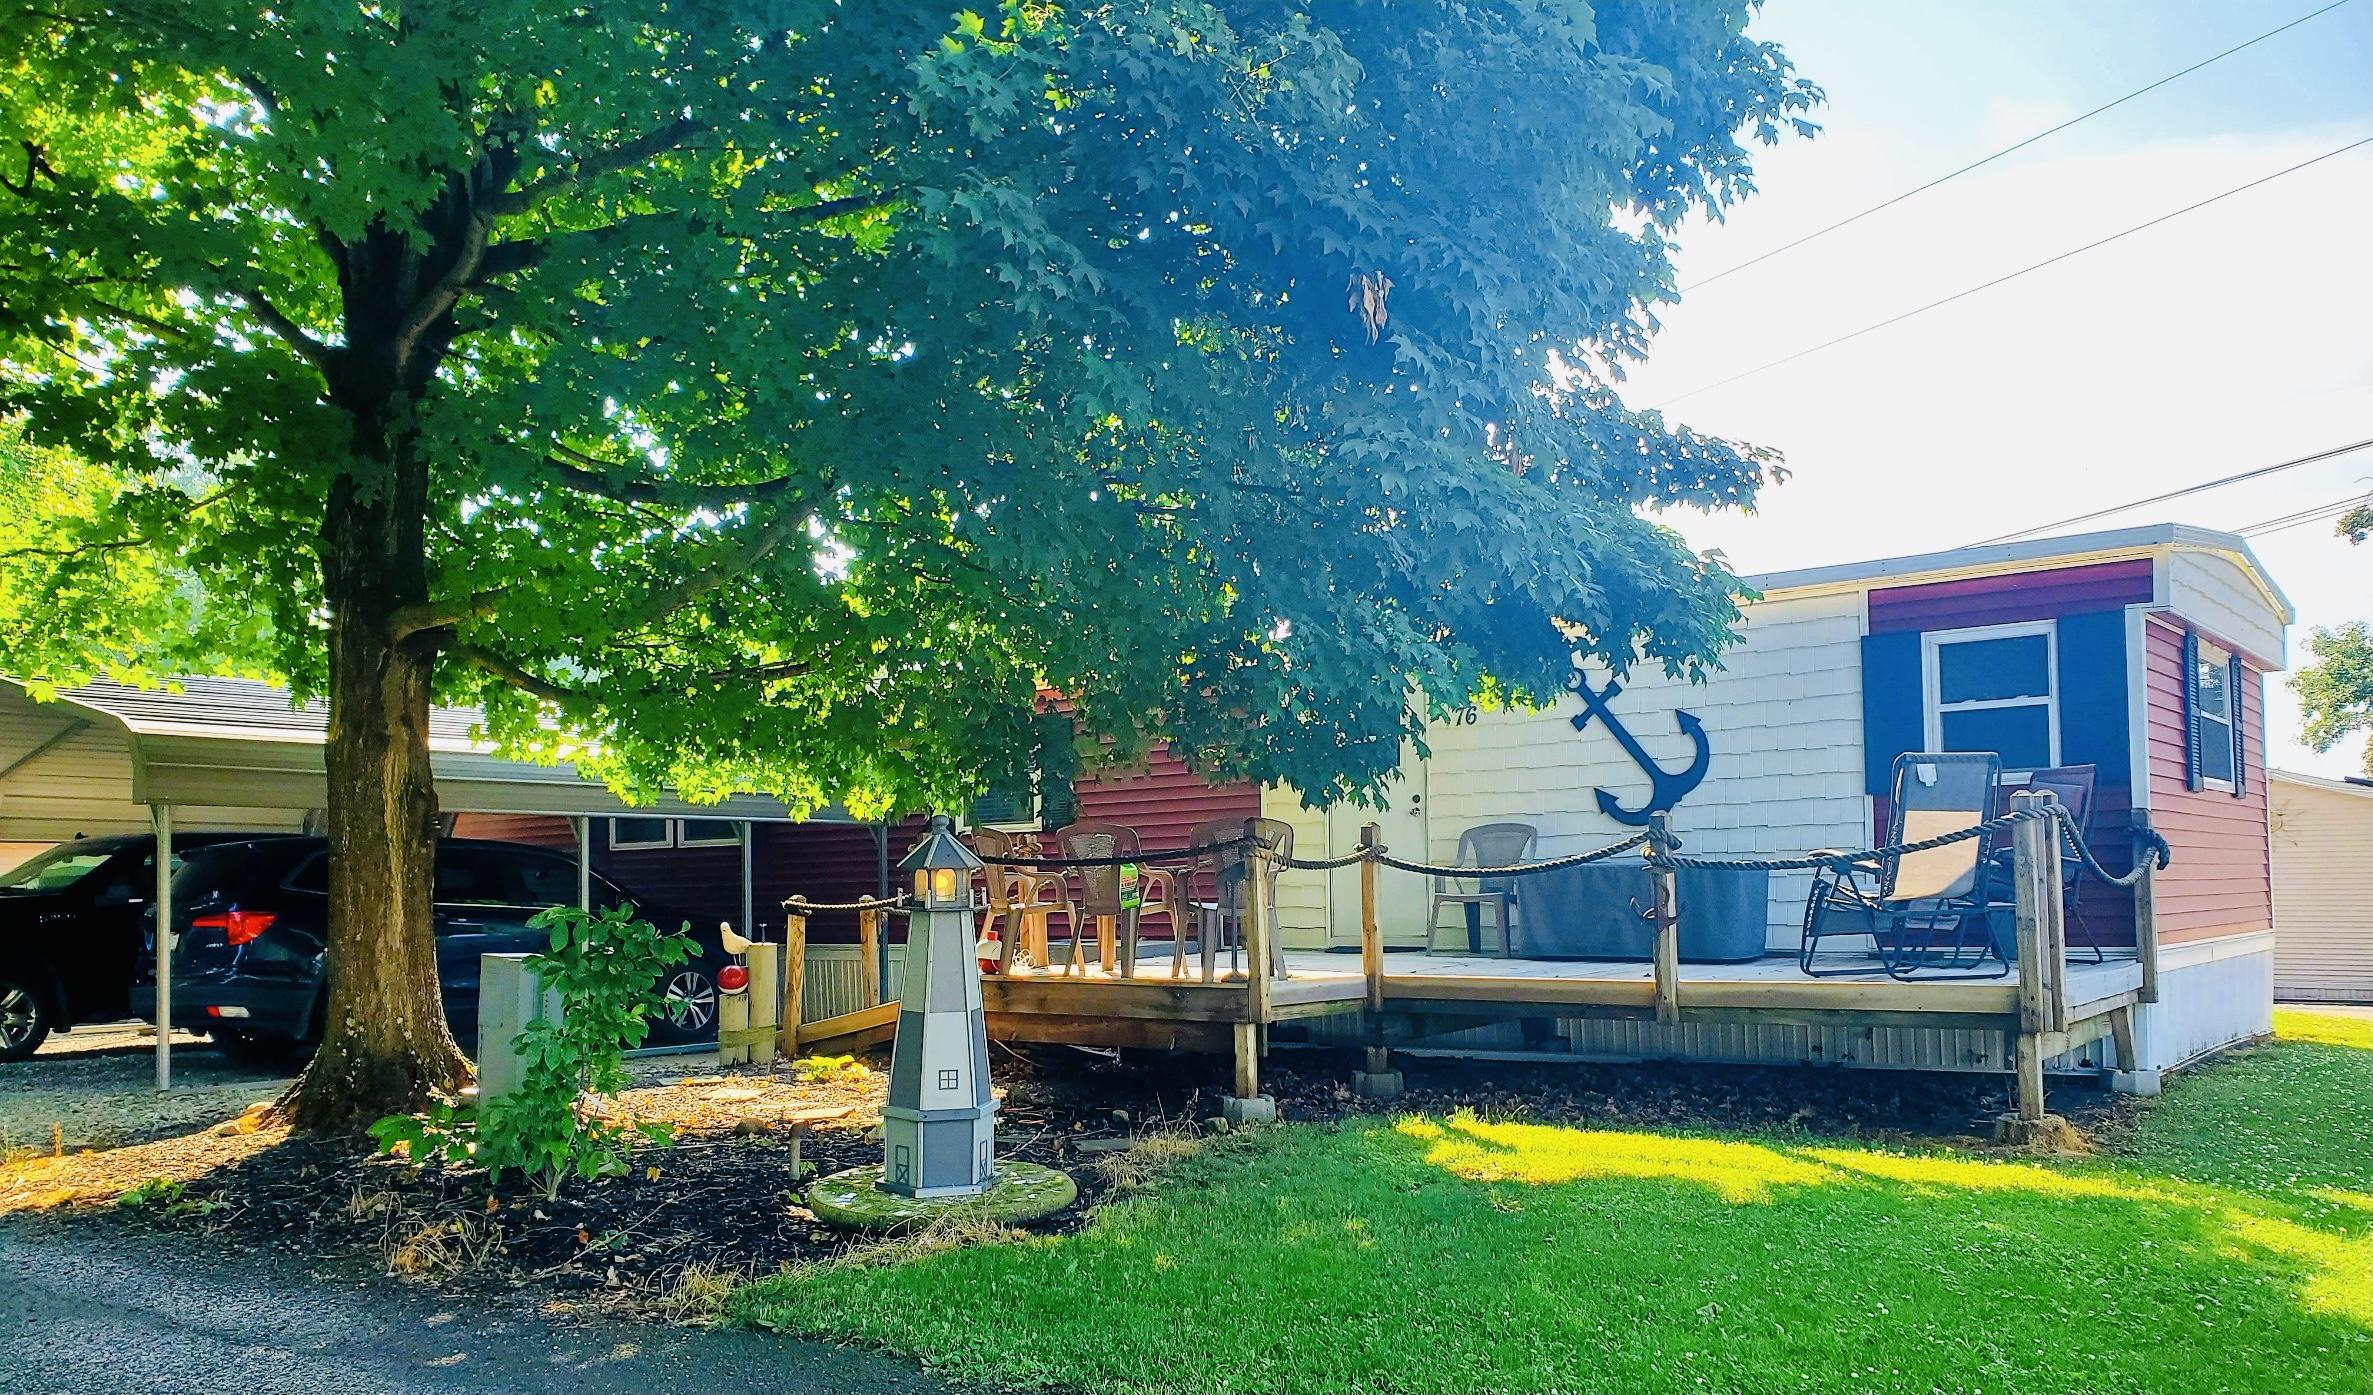 8651 S R 368 Lot 76-c Property Photo 1